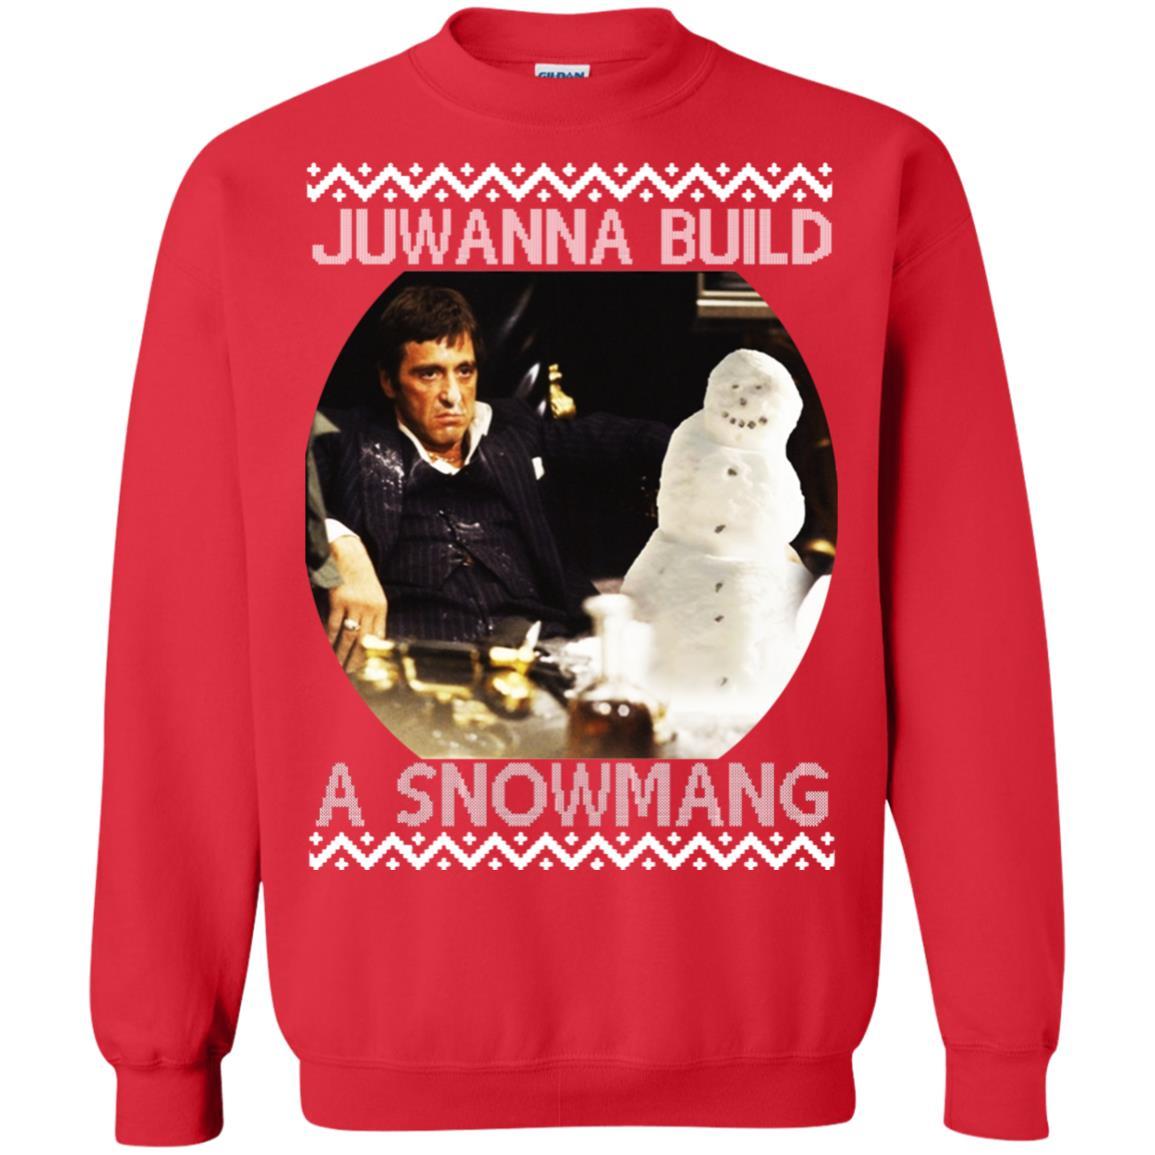 Scarface Juwanna Build A Snowman Christmas Ugly Sweatshirt Shirt